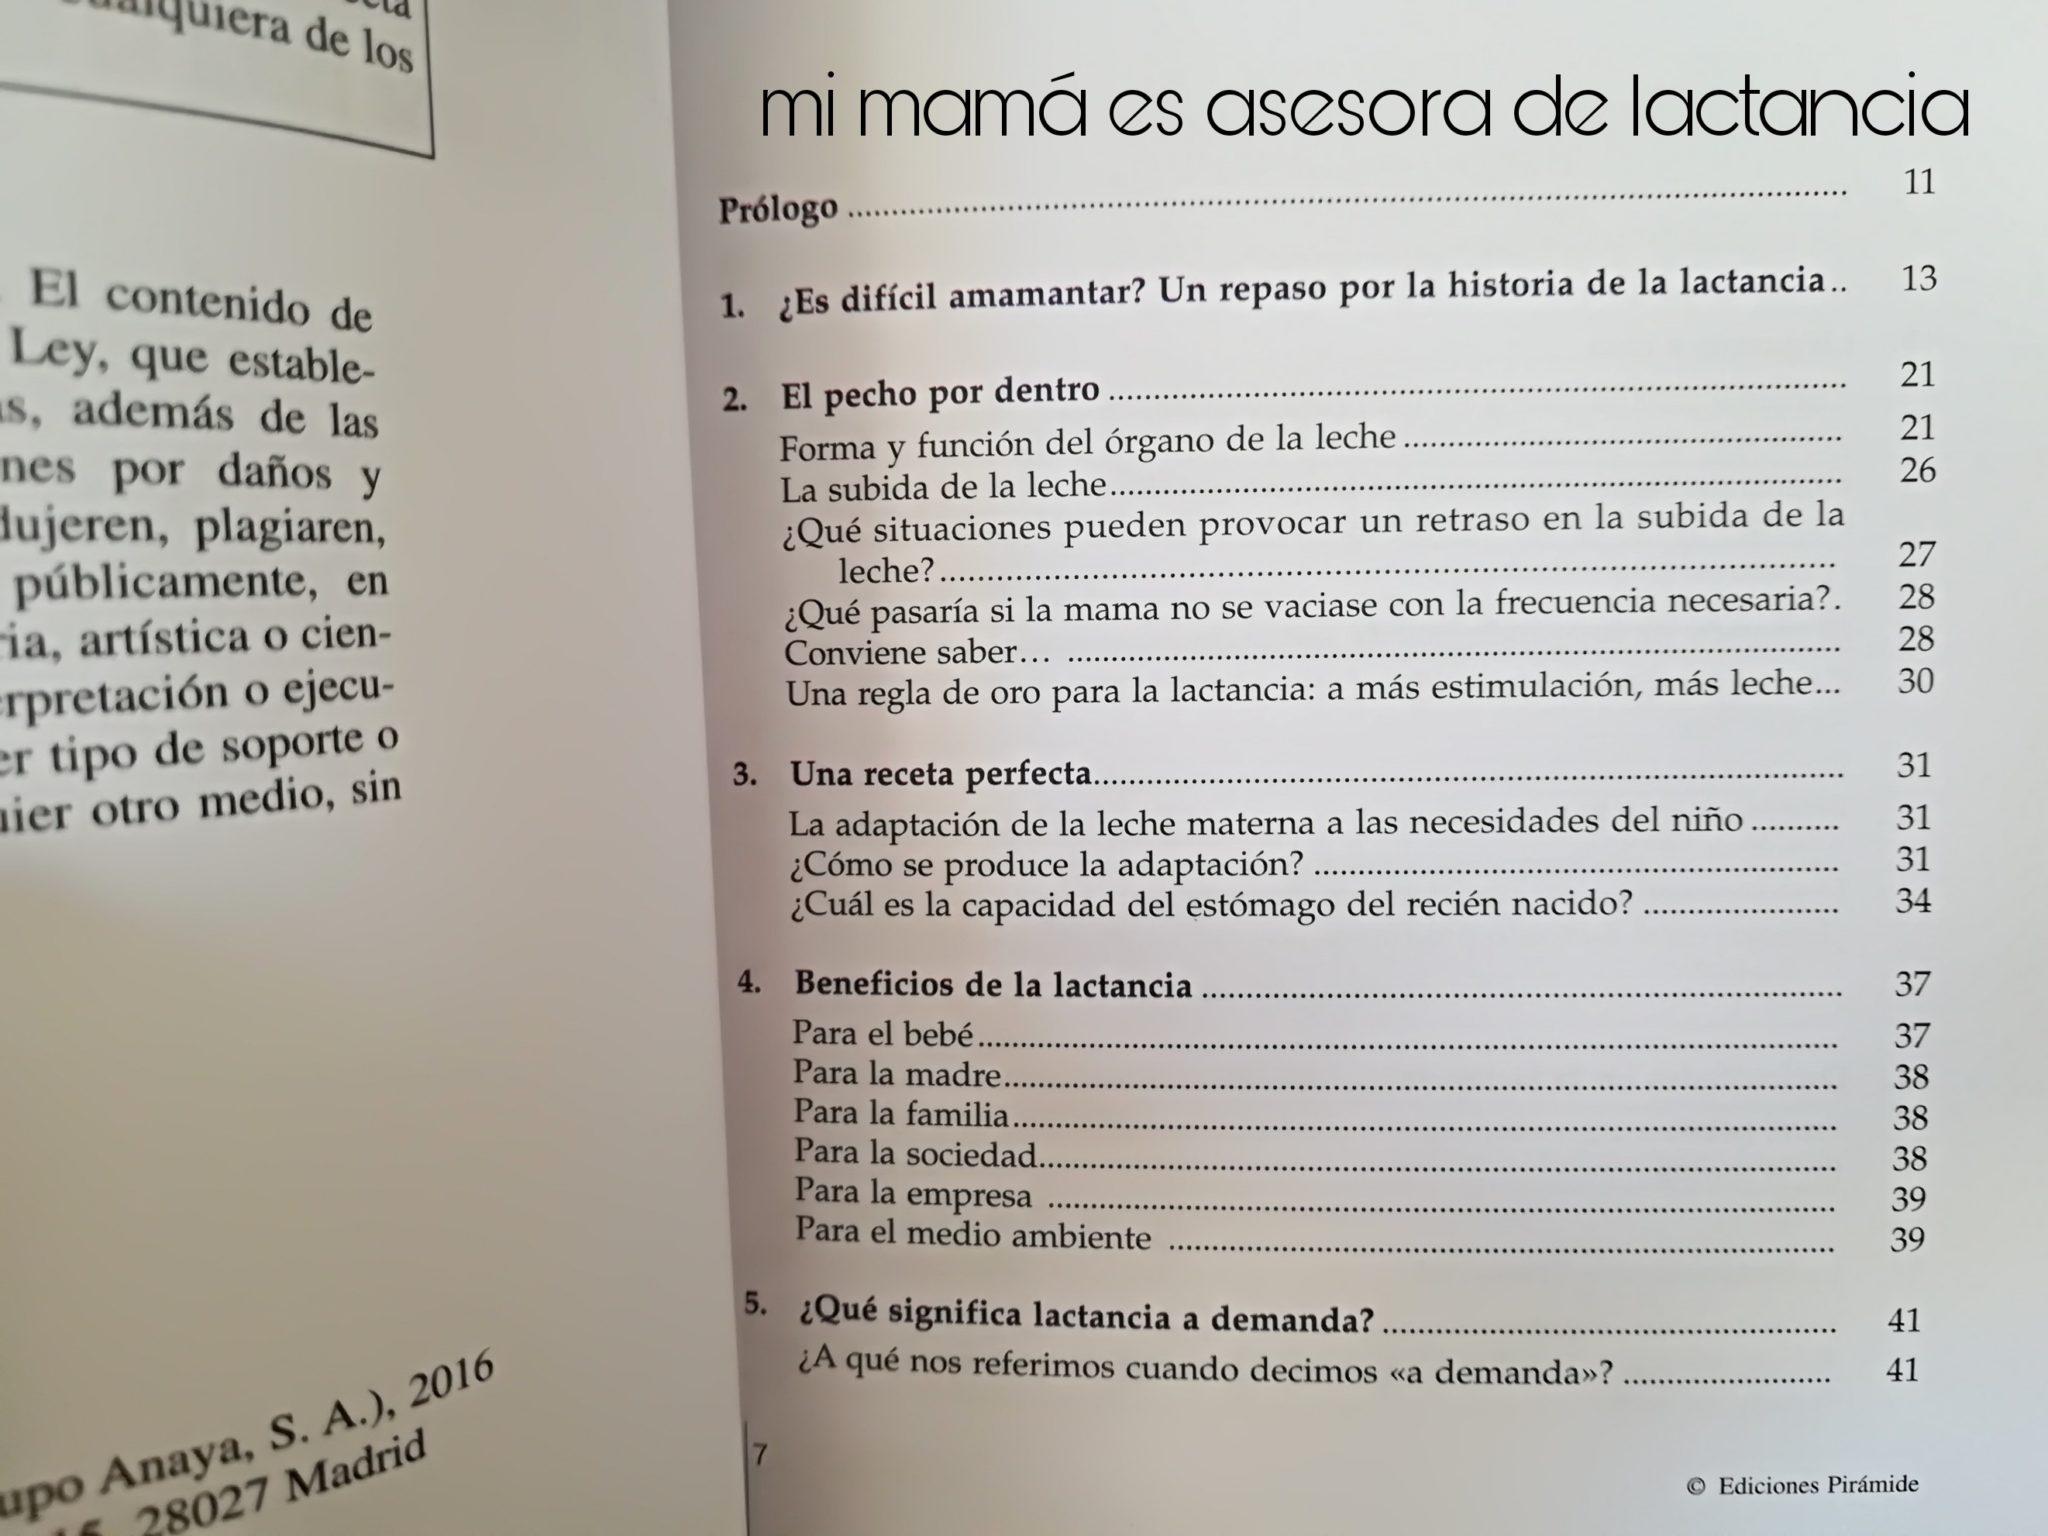 PicsArt 04 01 01.11.00 - Leemos: Vas a ser Mamá. Guía de lactancia materna.